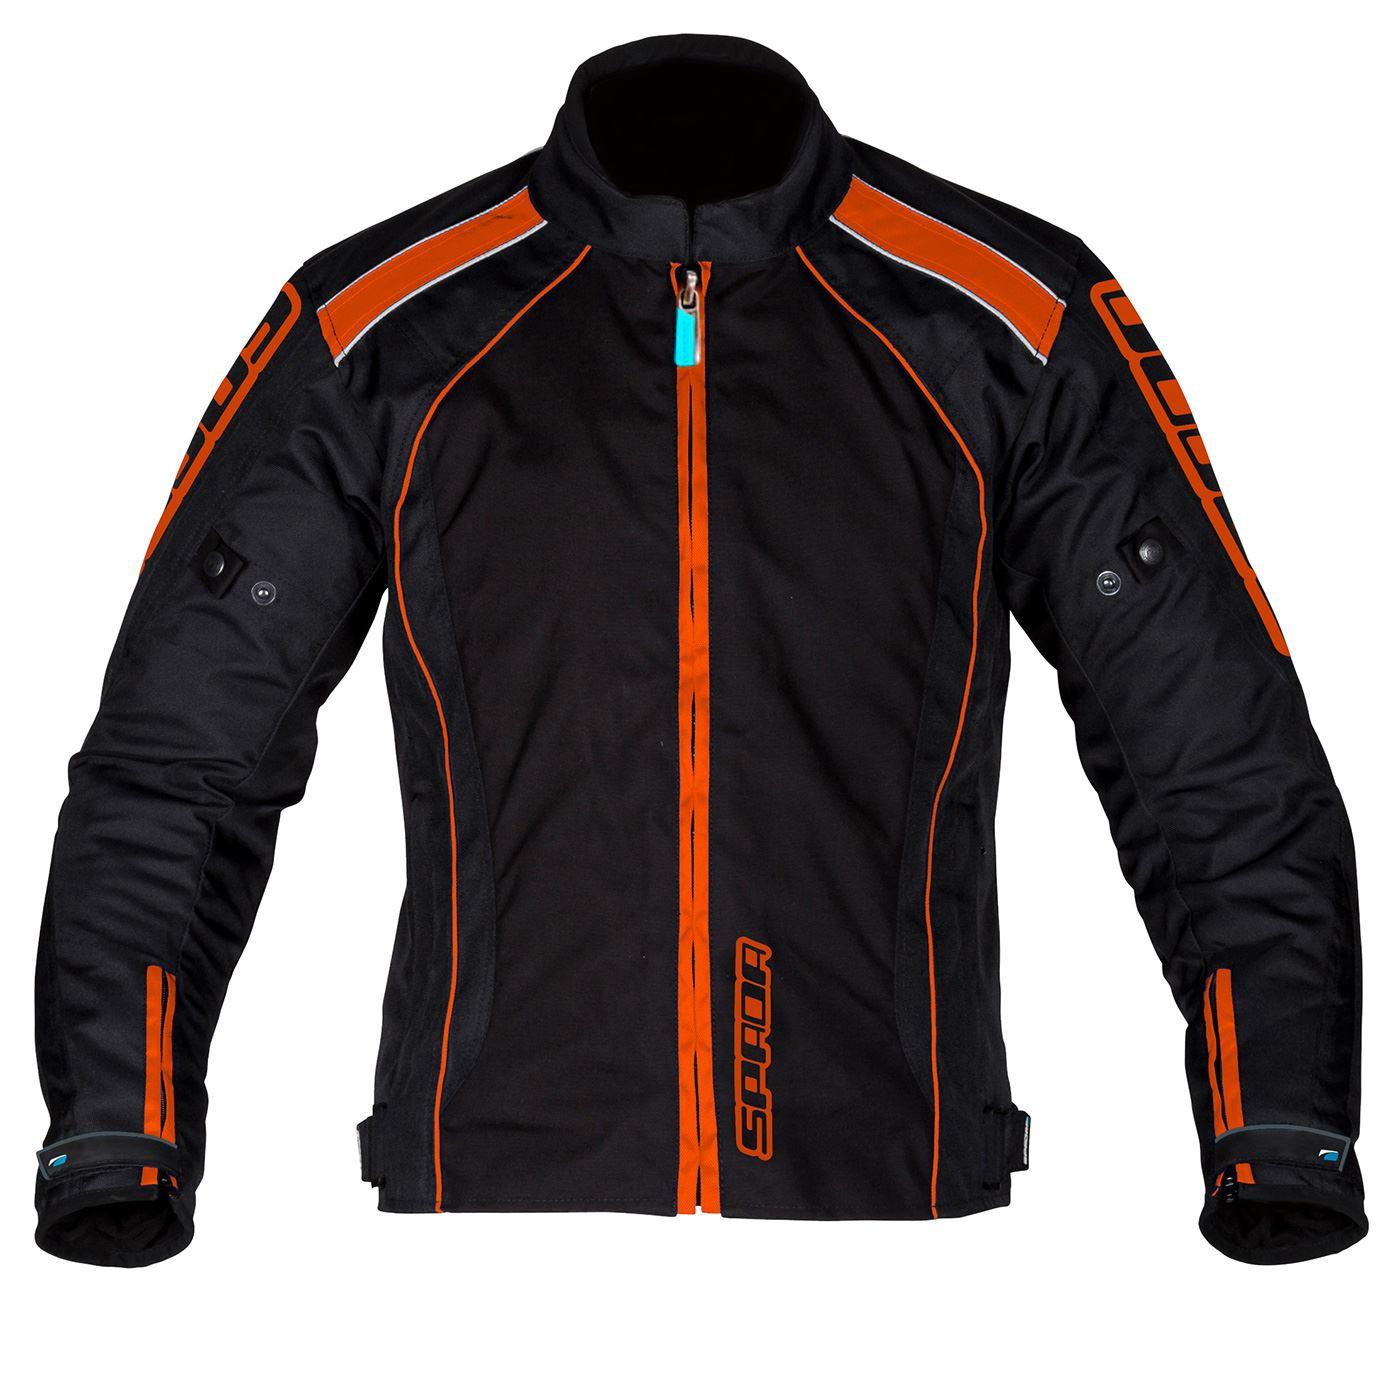 Spada-Plaza-Motorcycle-Jacket-Black-KTM-Orange-Waterproof-Thermal-M-2XL thumbnail 9